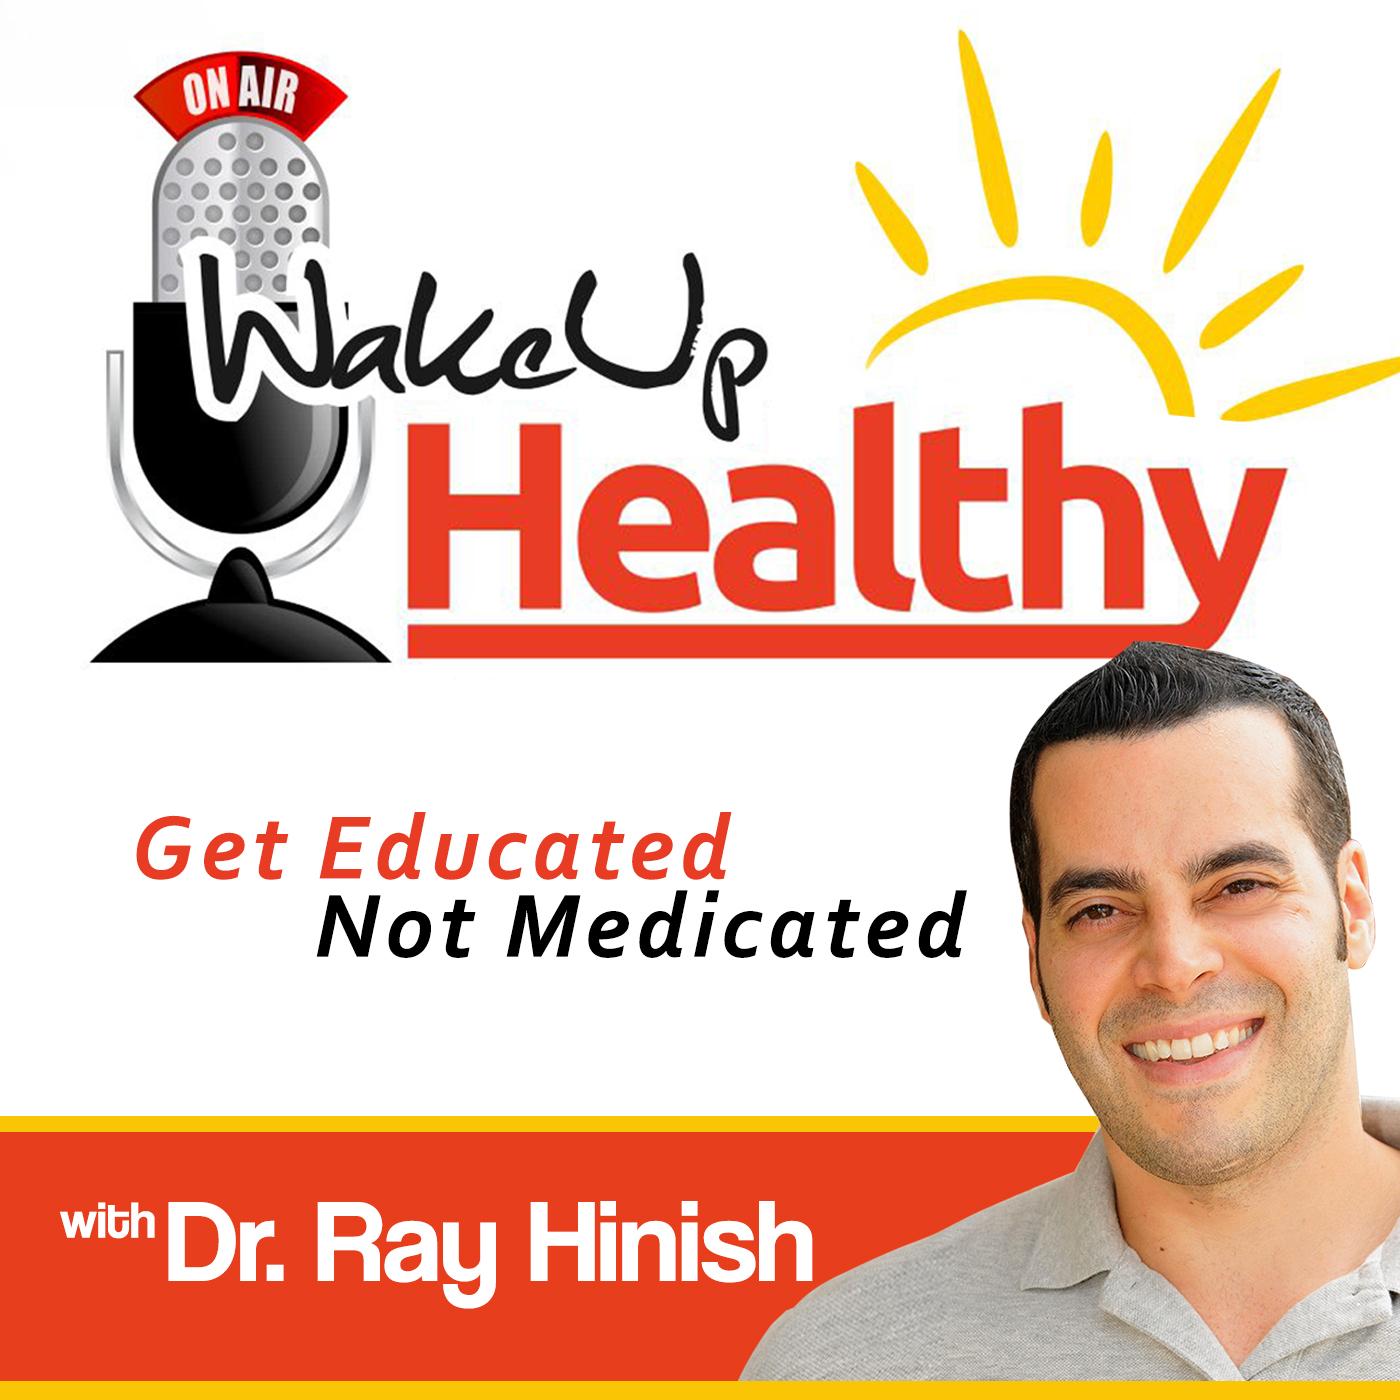 Wake Up Healthy Health Podcast   Wellness Podcasts   Nutrition Podcast   Alternative Medicine   Natural Health   Holistic Medicine